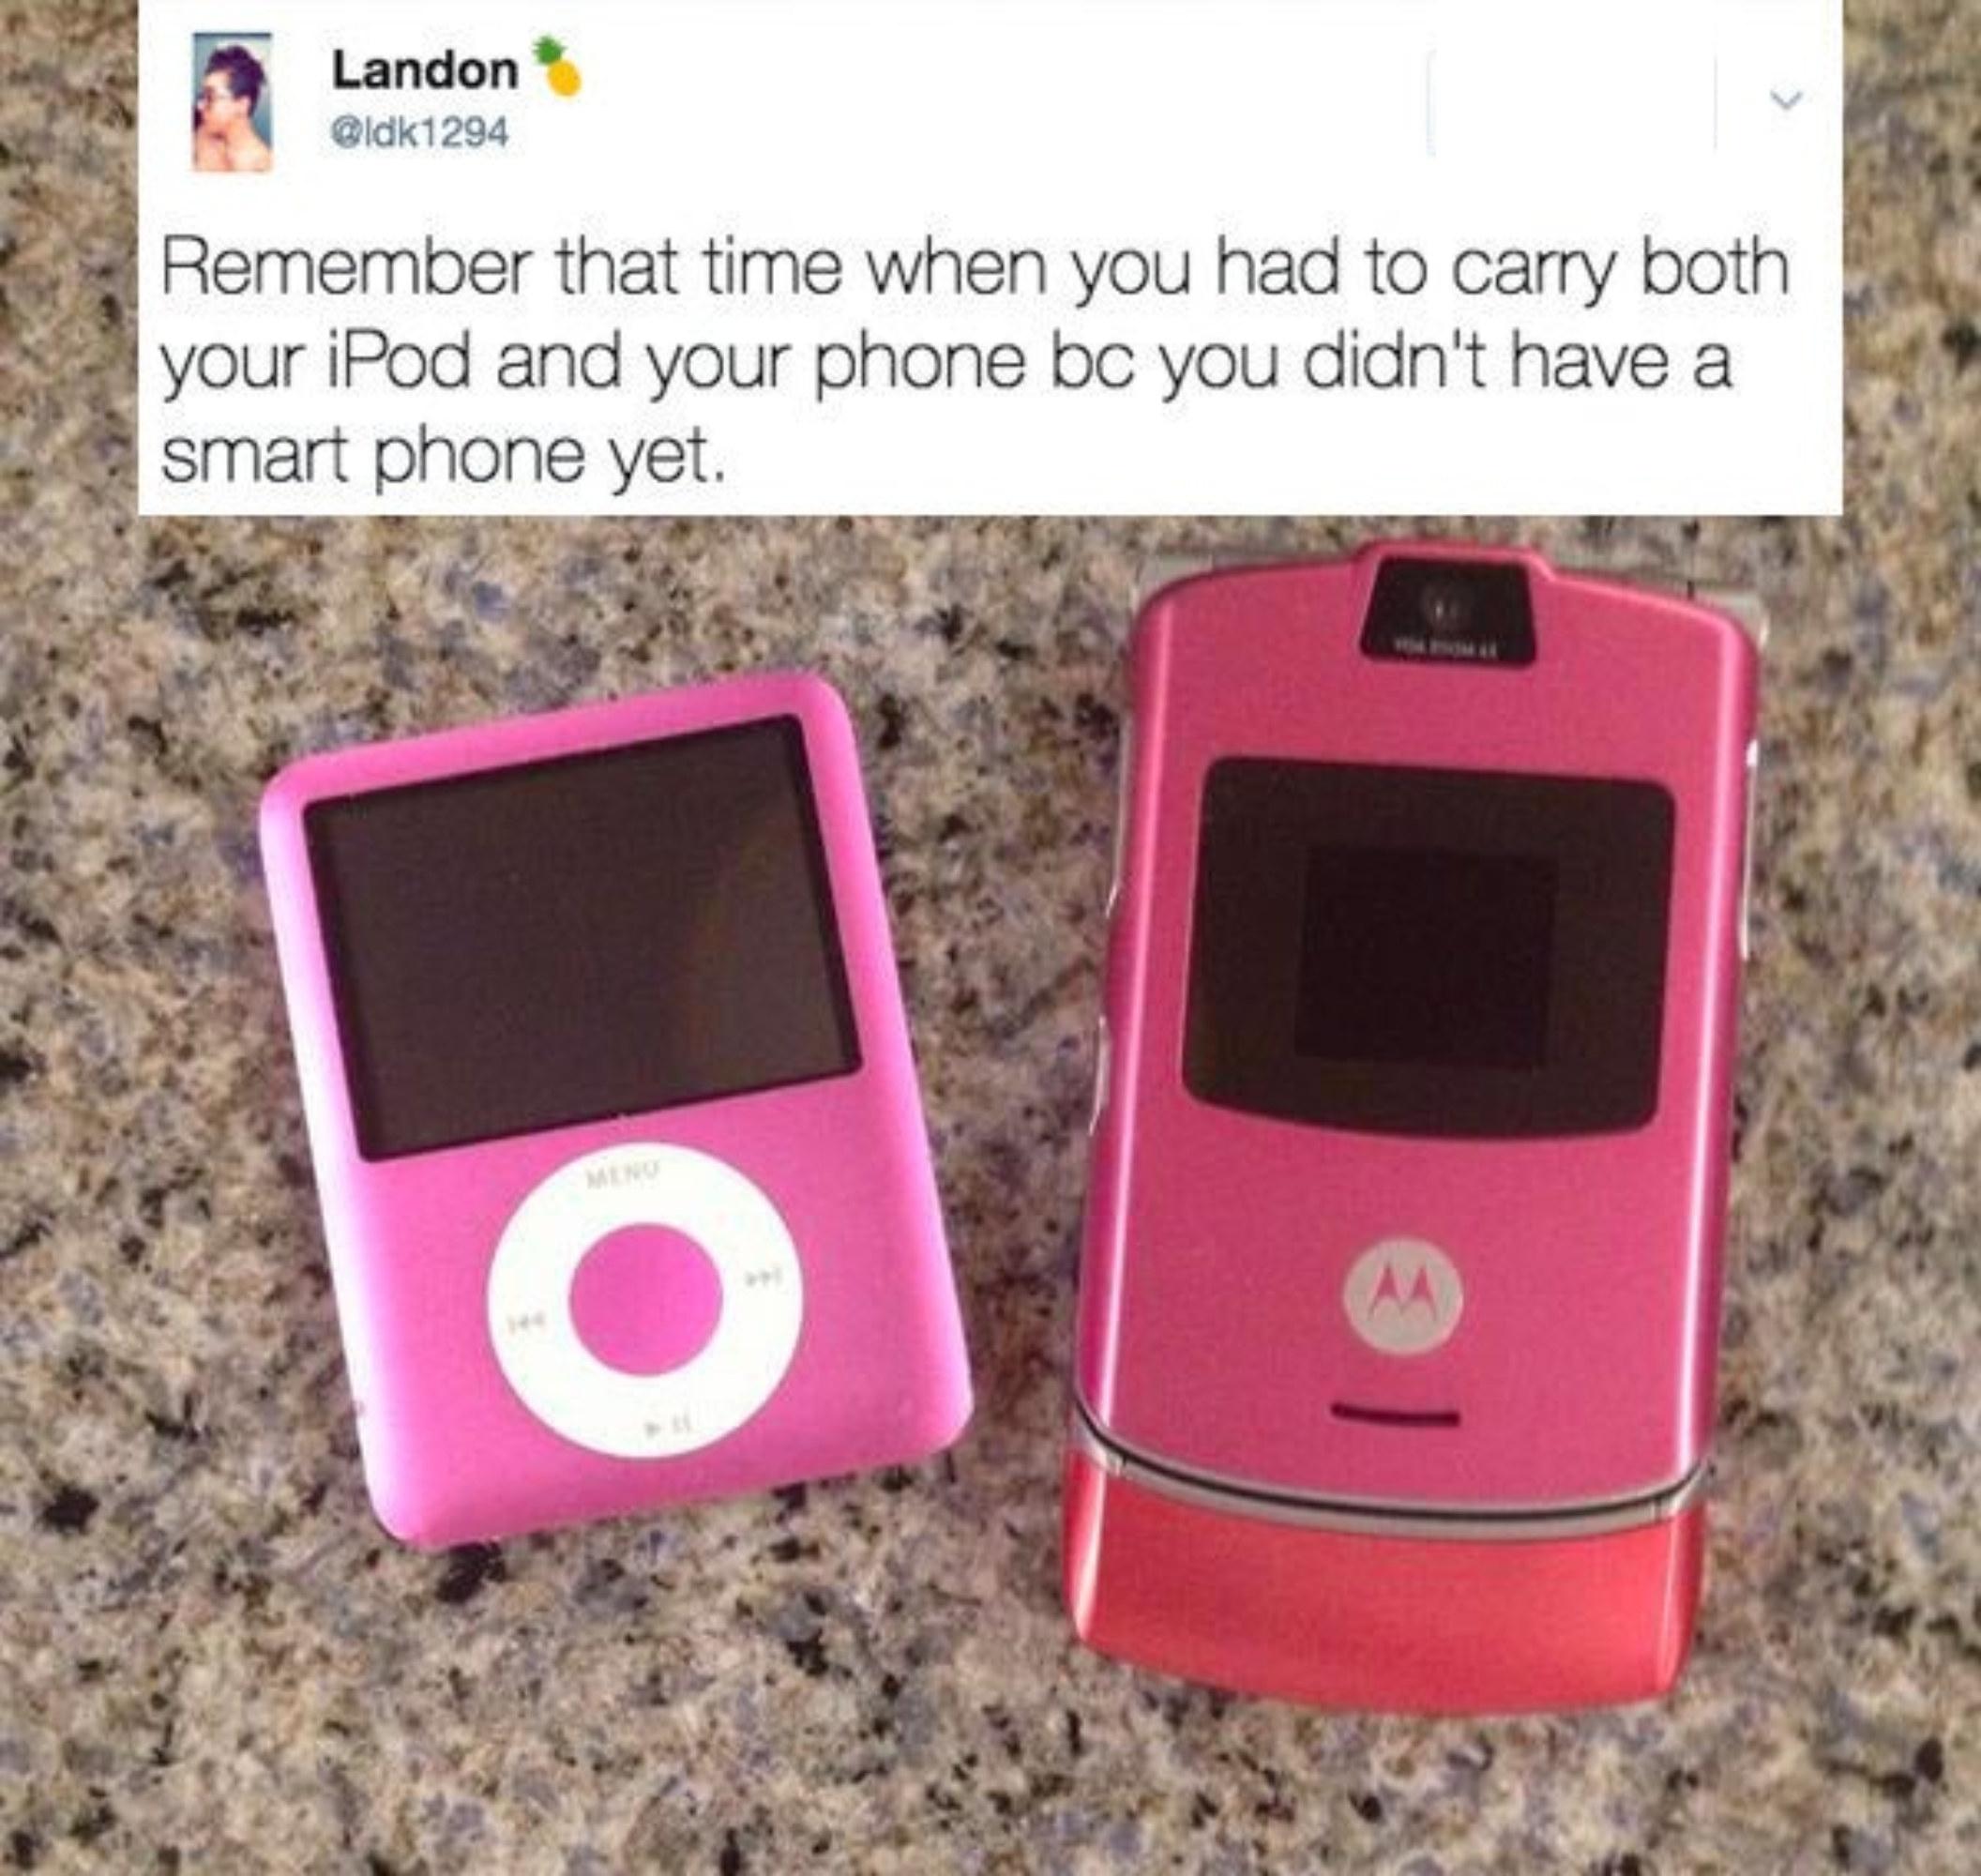 A pink iPod Mini next to a pink Razr